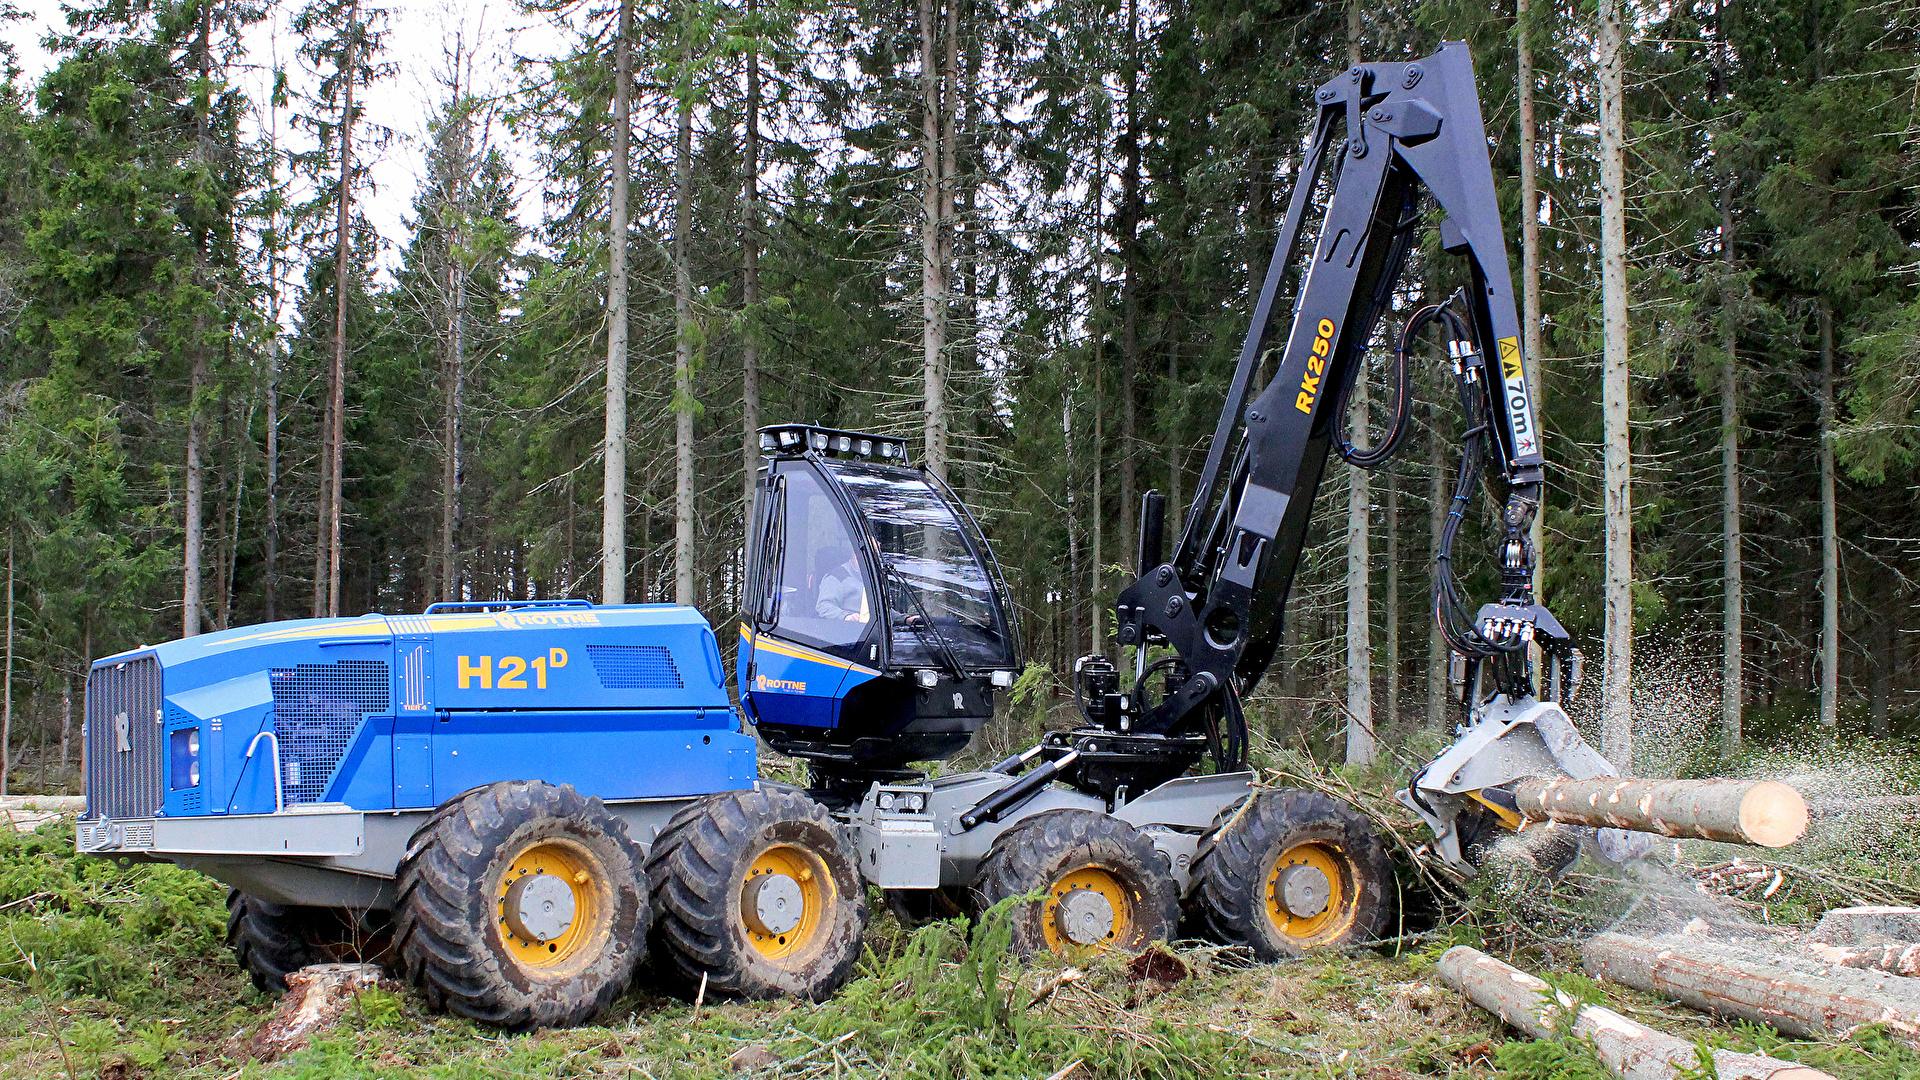 Фотографии Форвардер 2013-18 Rottne H21D бревно лес 1920x1080 Бревна Леса